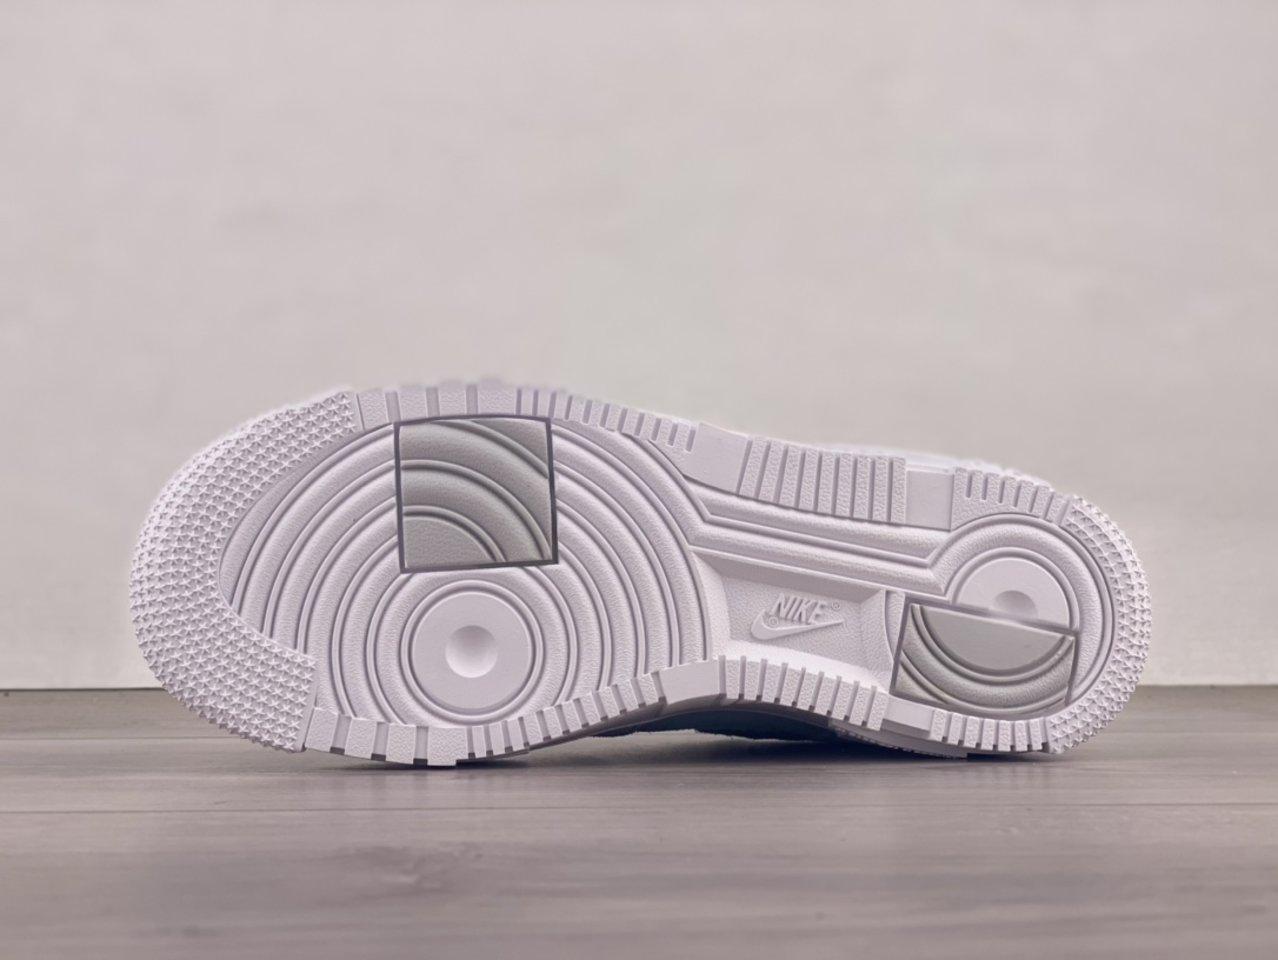 Nike Air Force 1 Pixel Glacier Blue Casual Shoes DH3855-400 Sole